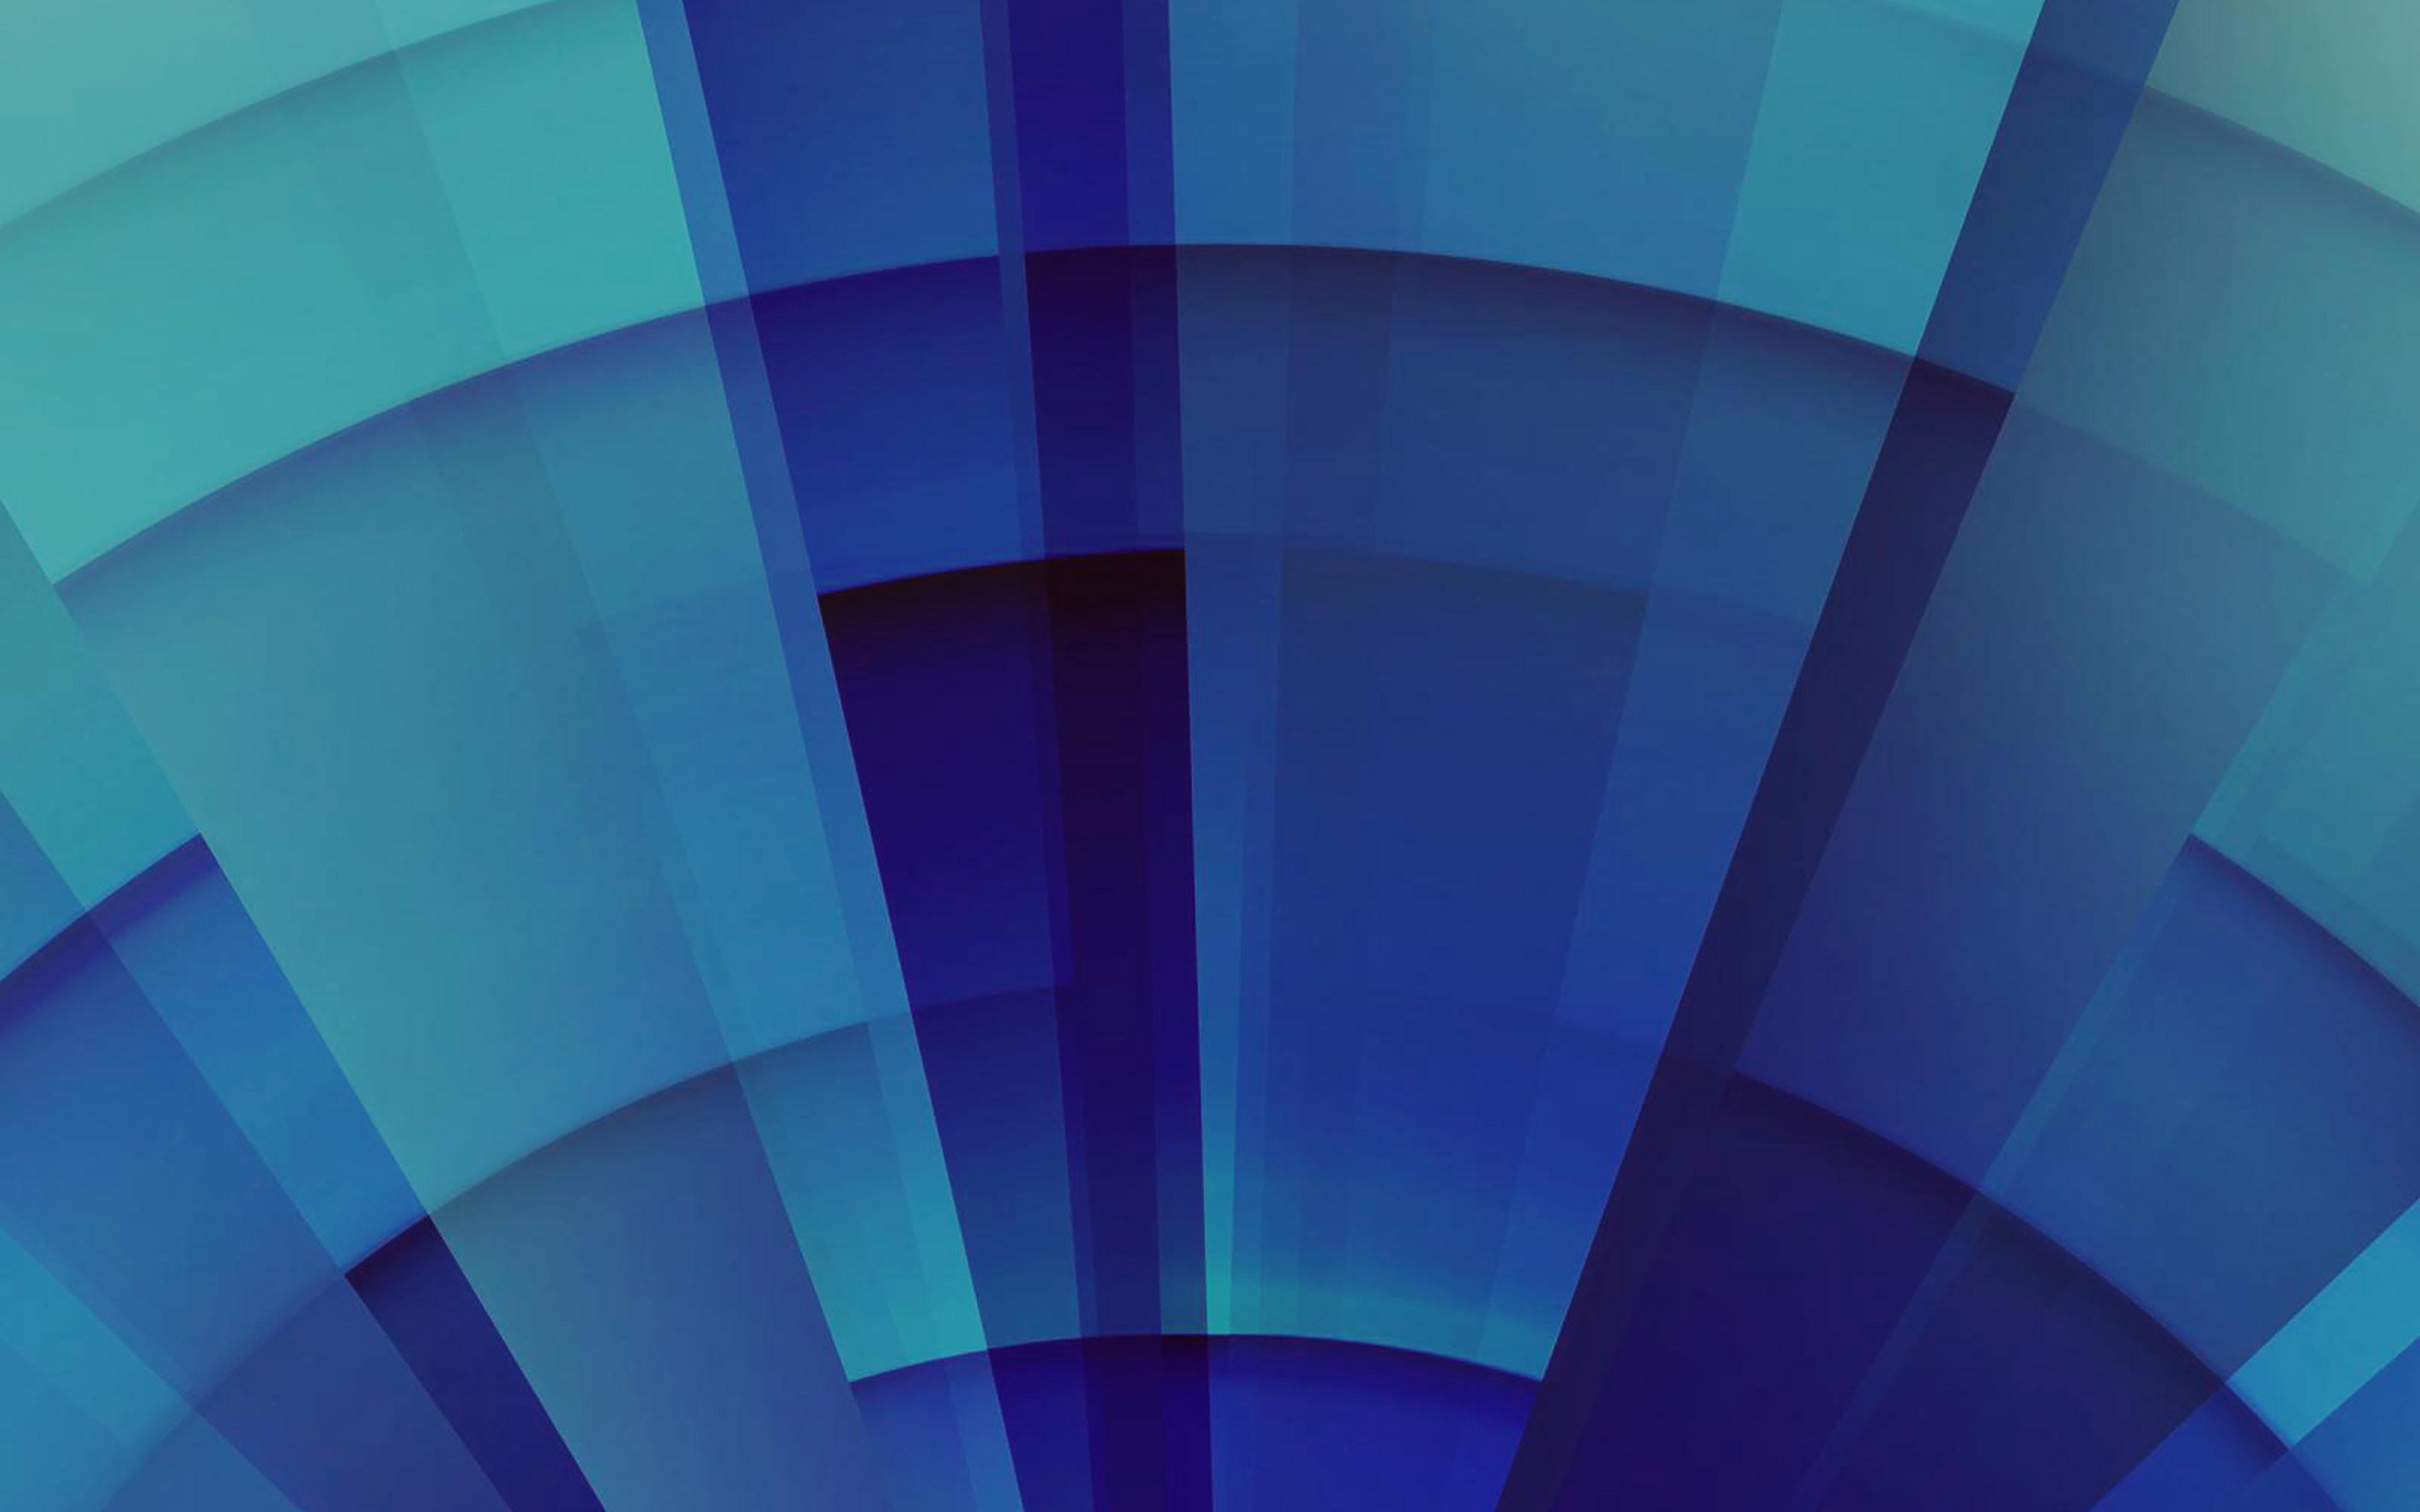 Vd96 Light Sunshine Blue Pattern Abstract Digital Wallpaper